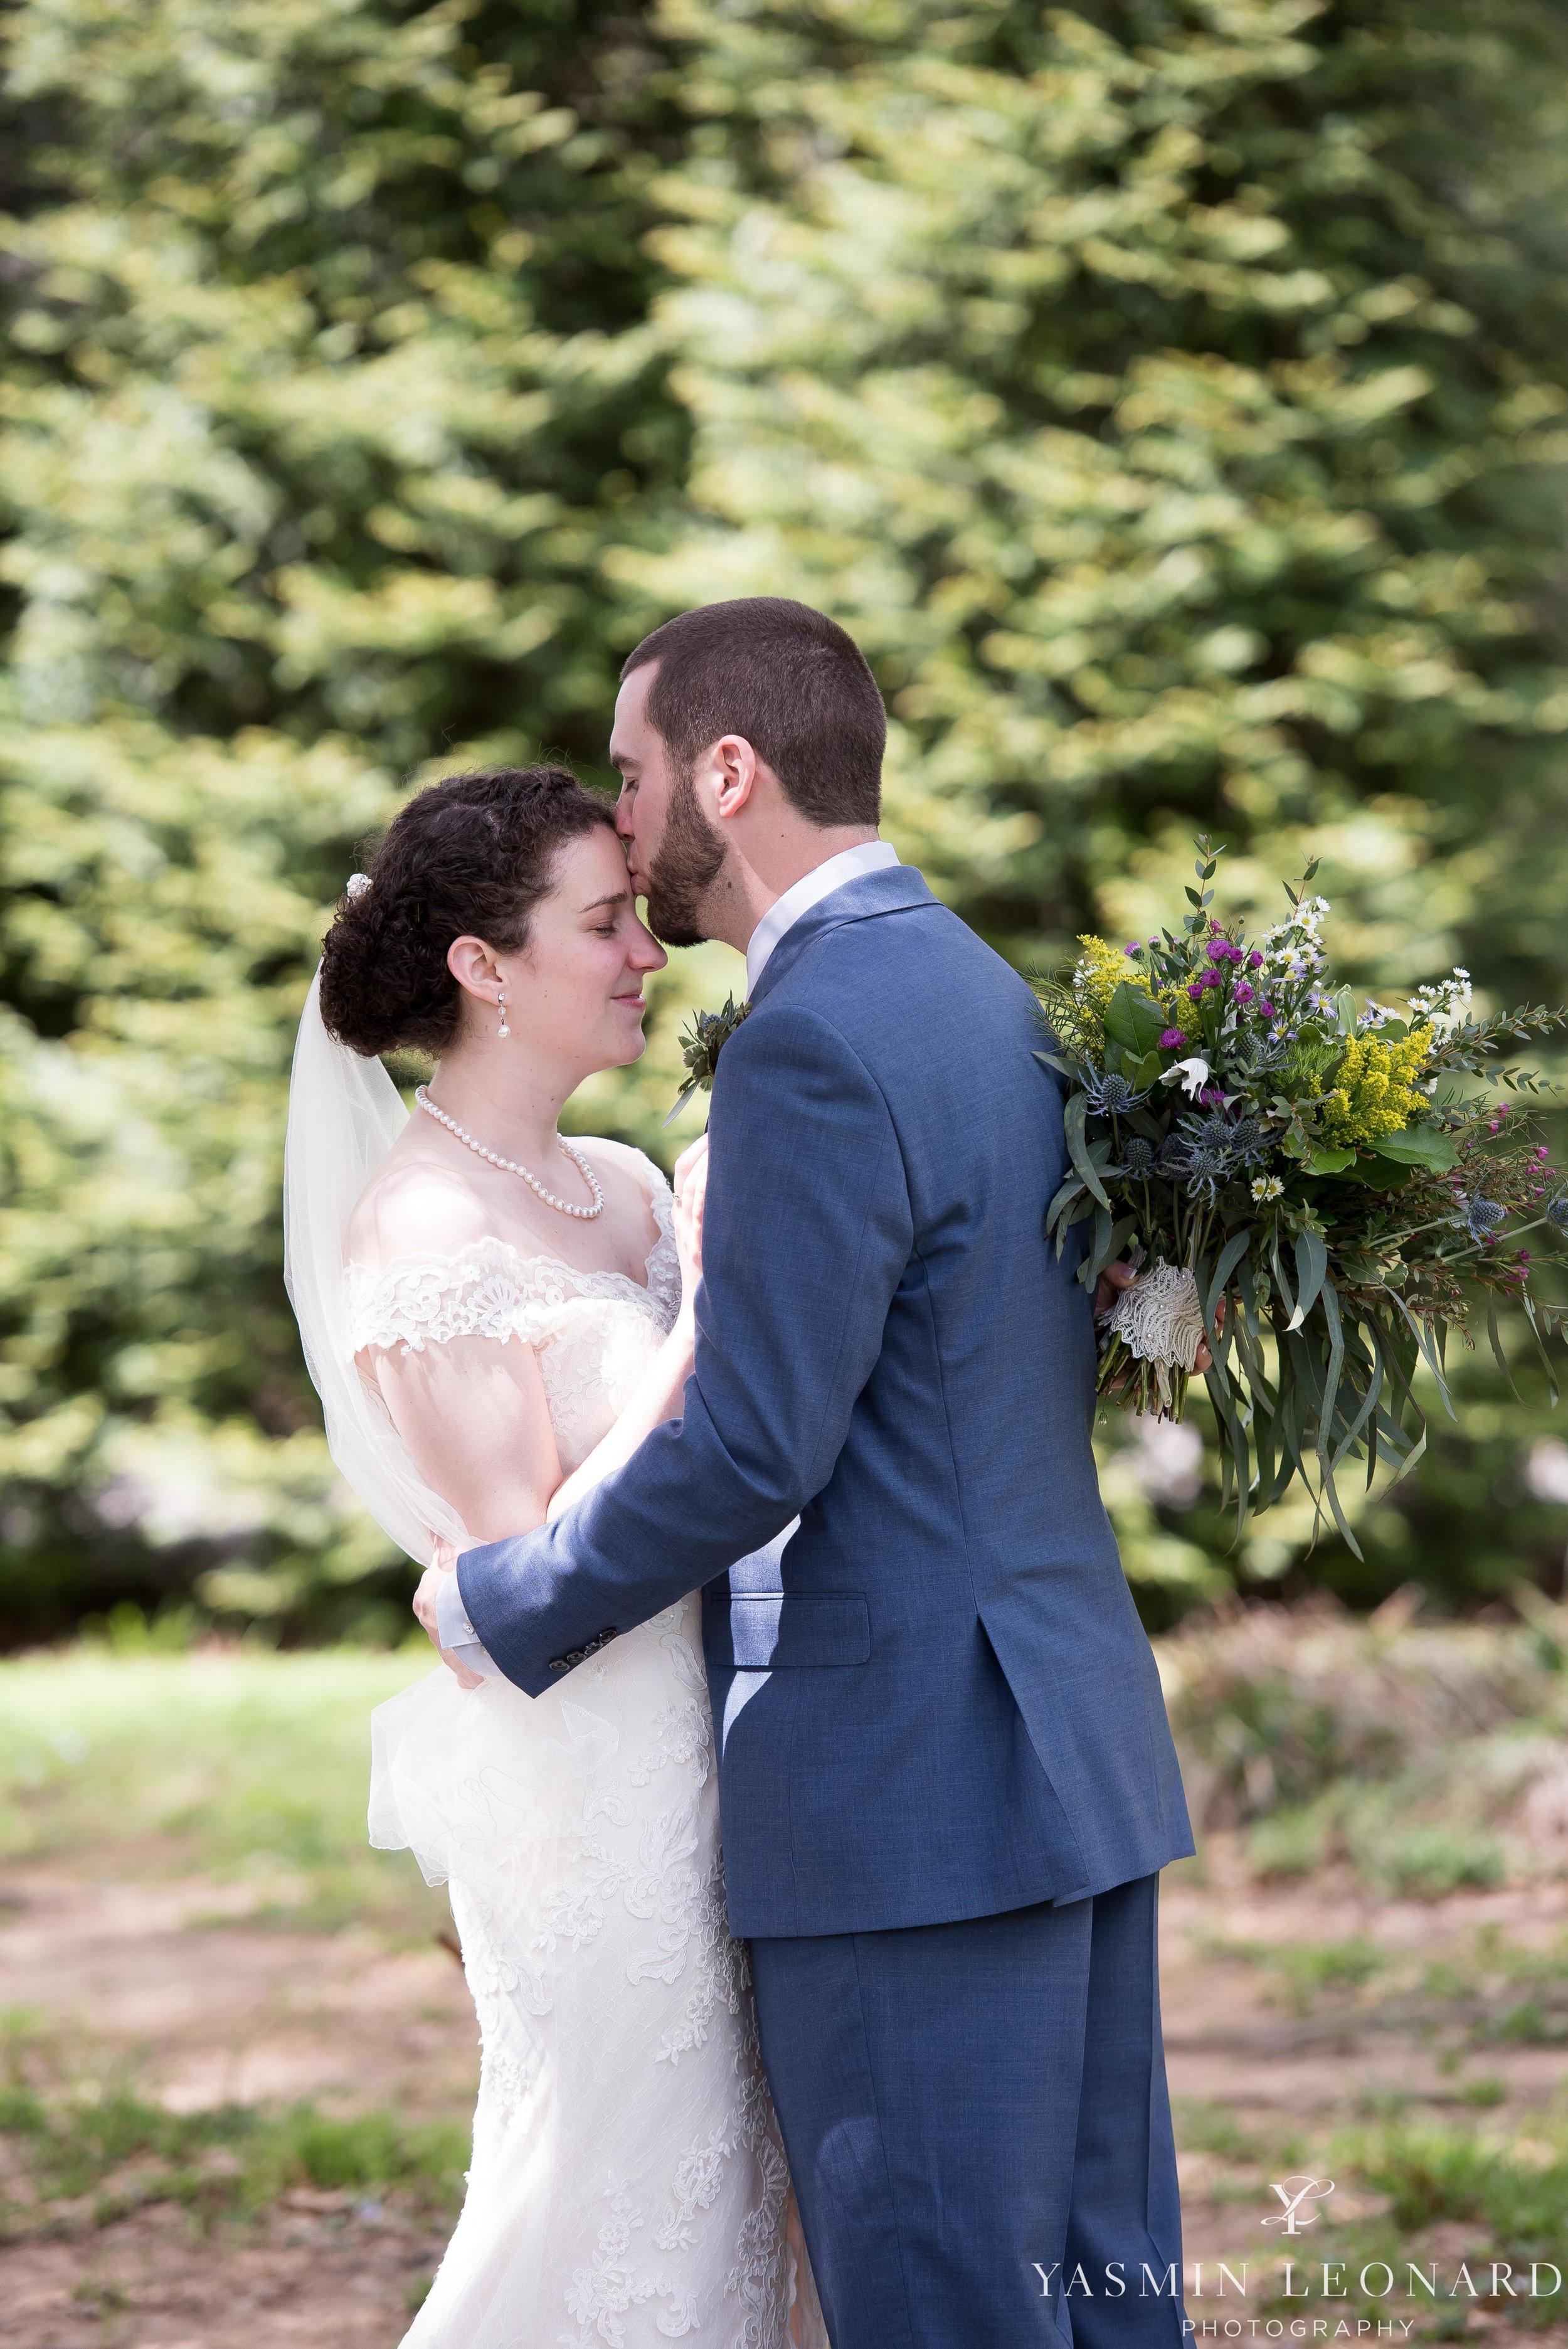 Courtney and Justin - L'abri at Linwood - Yasmin Leonard Photography-38.jpg